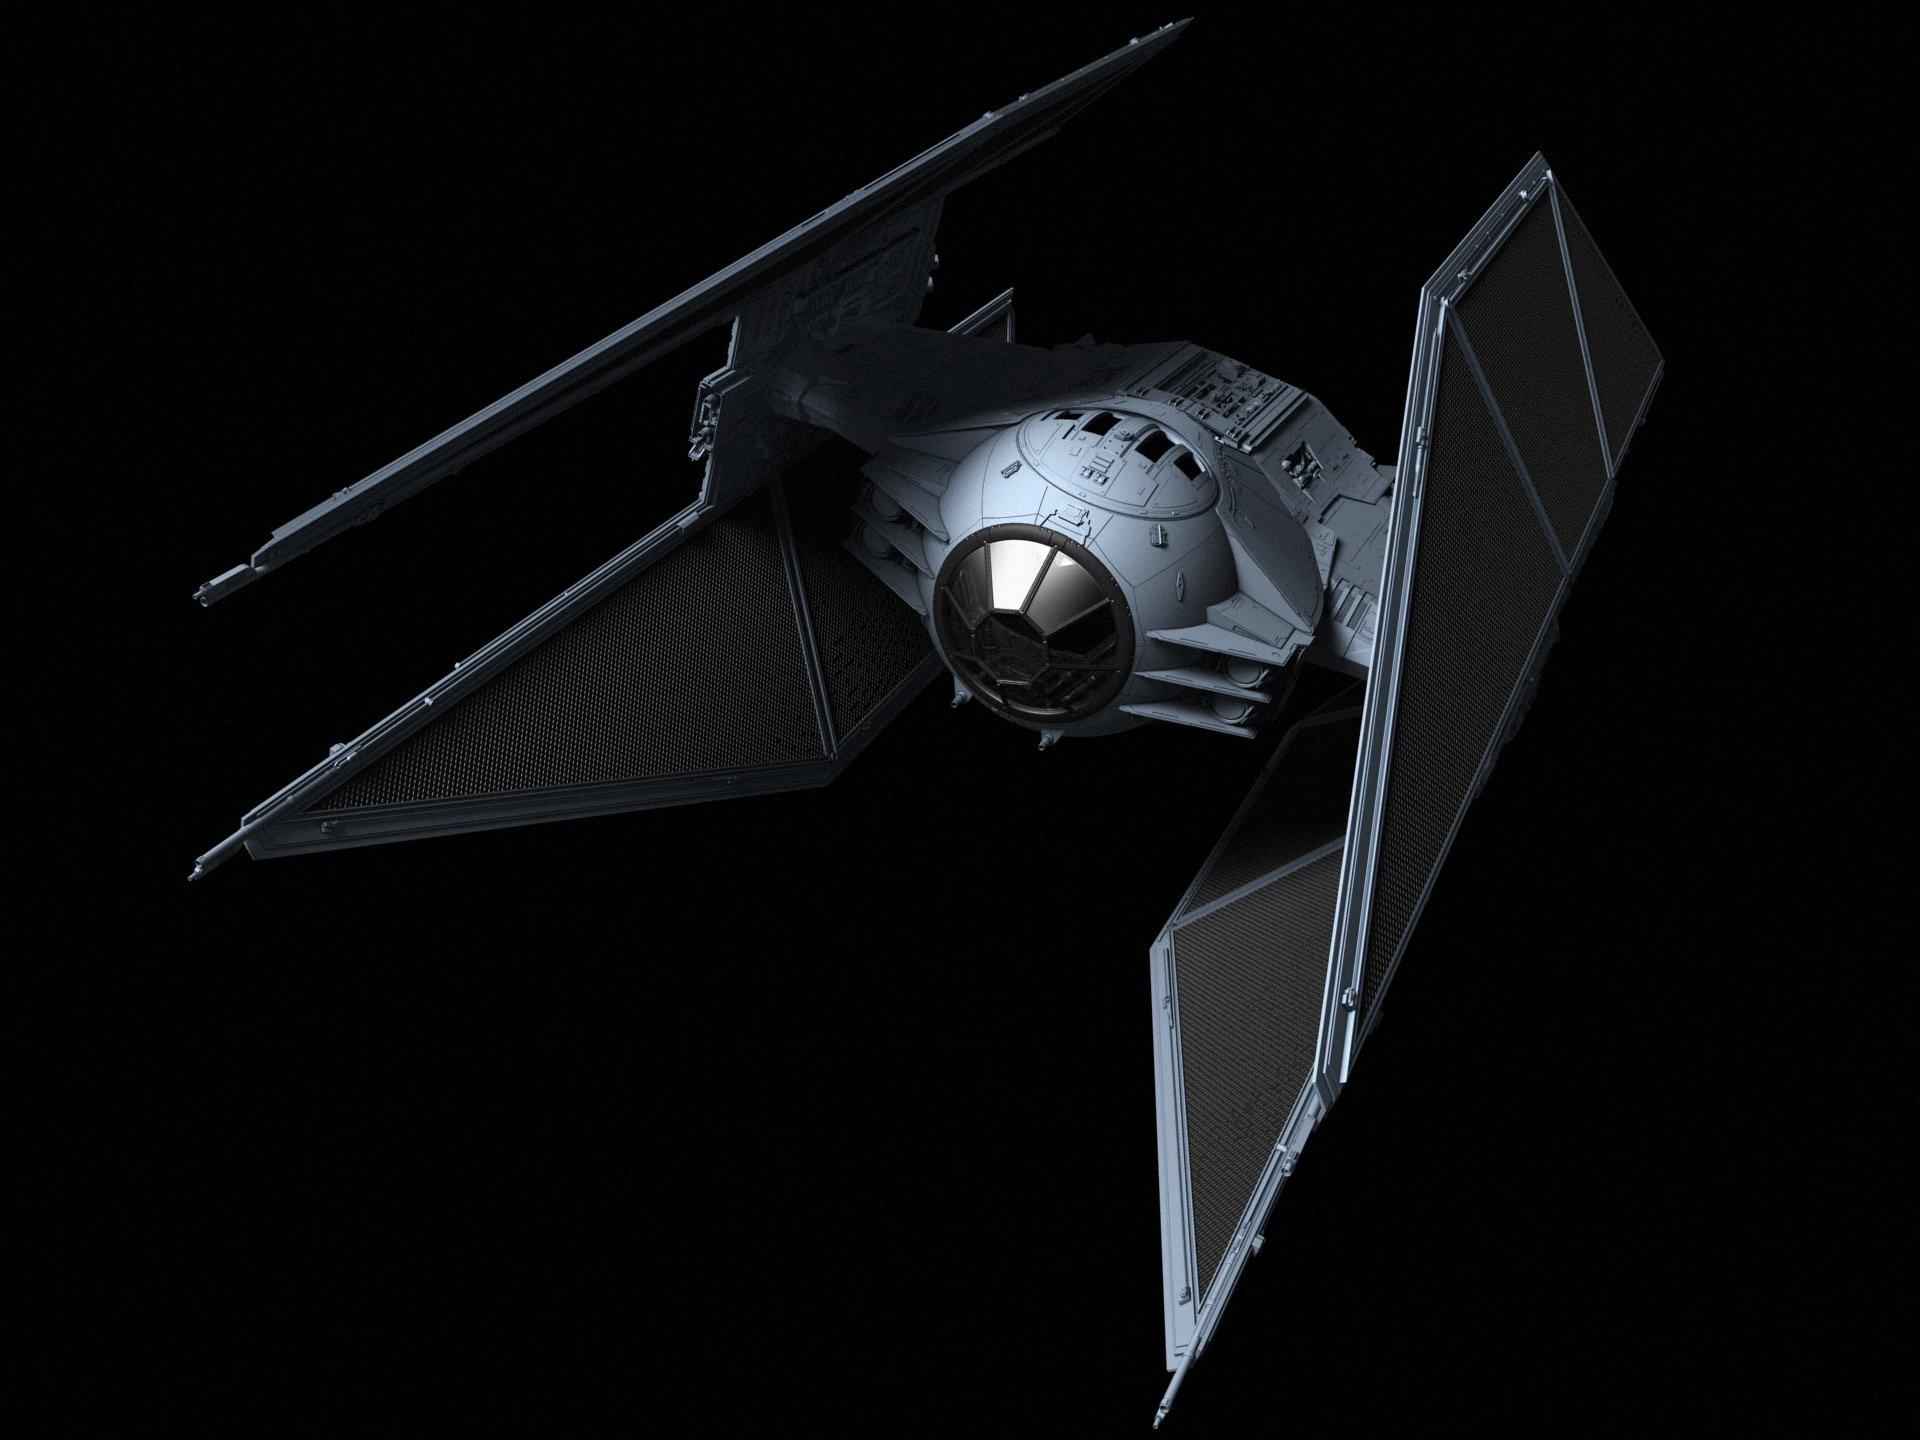 TIE FIGHTER star wars futuristic spaceship space sci-fi wallpaper      811235   WallpaperUP